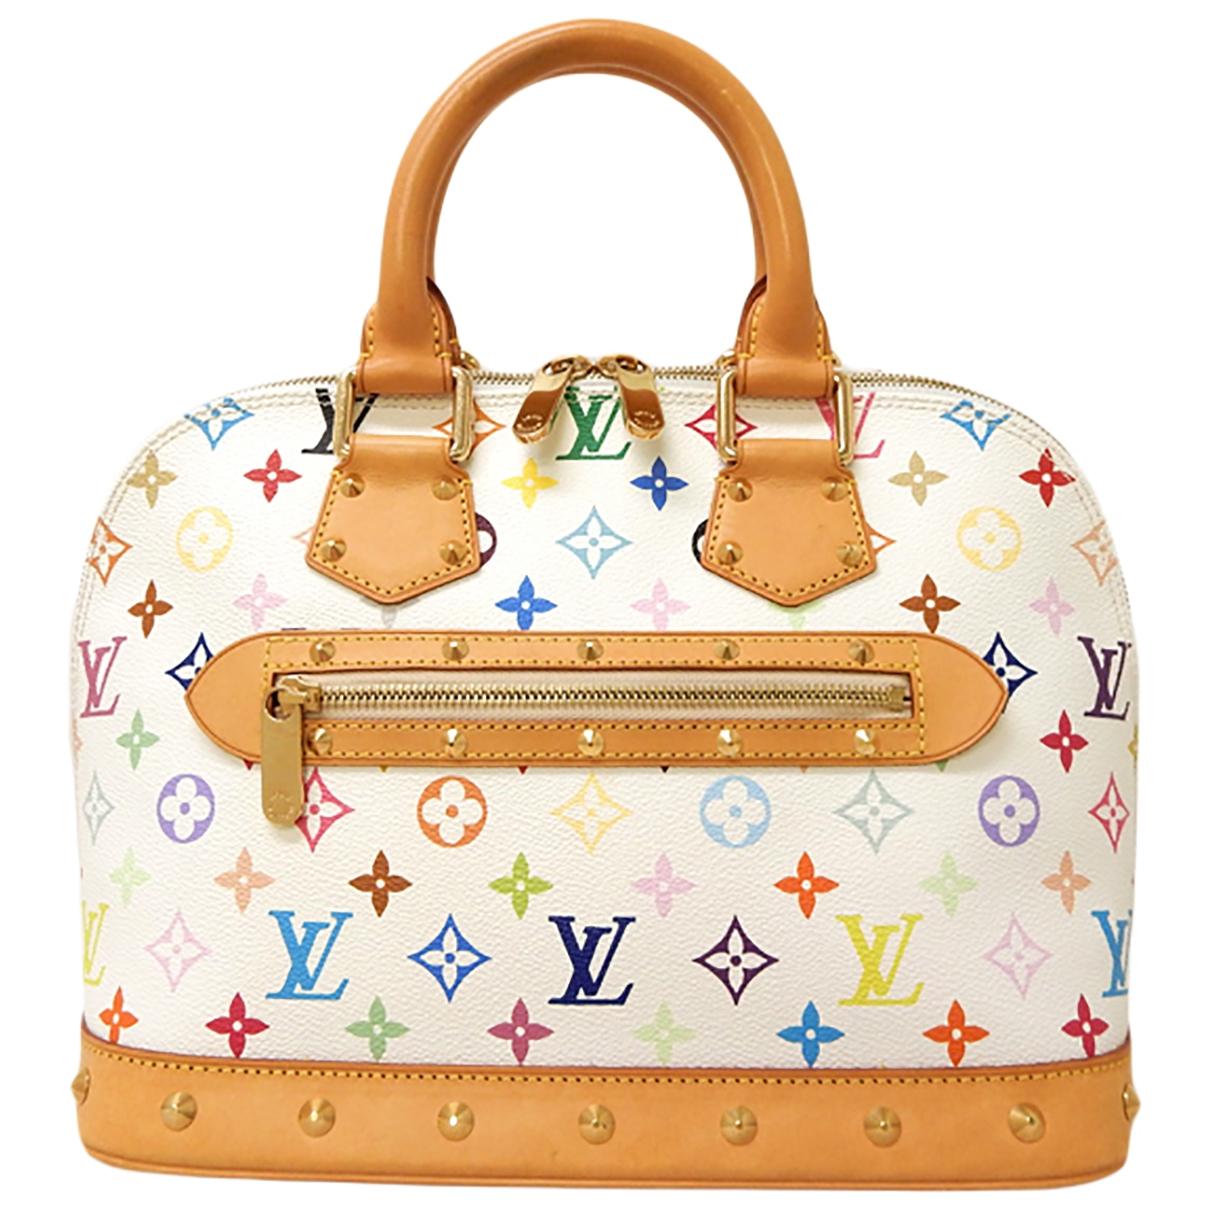 Louis Vuitton - Sac a main Alma pour femme en toile - blanc